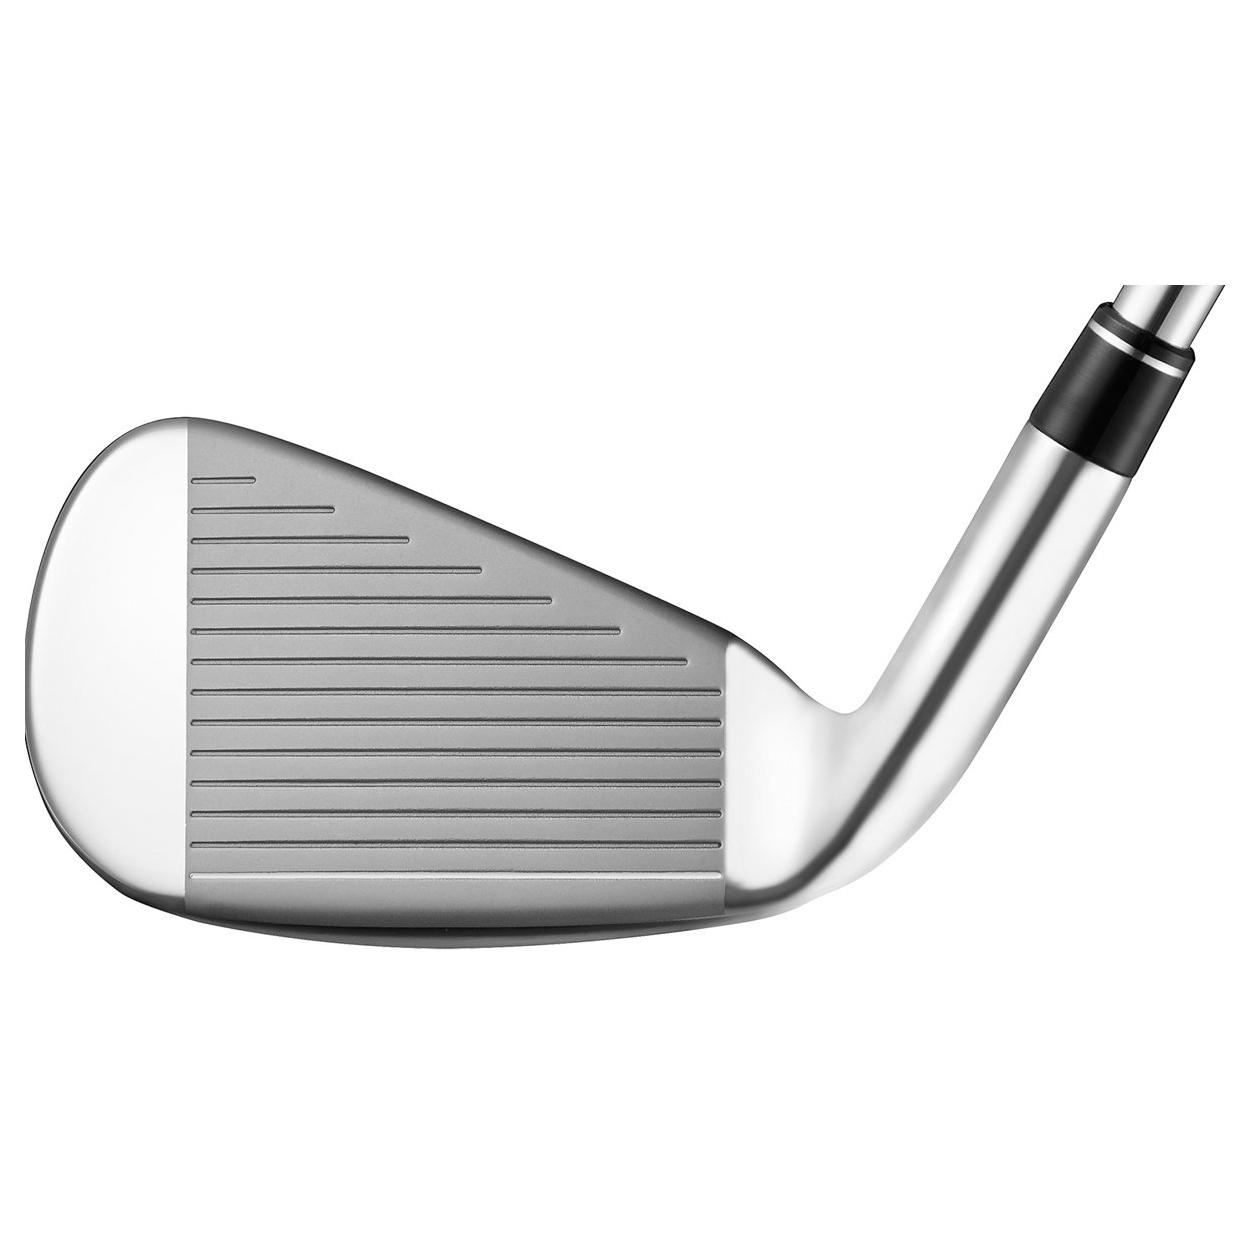 Taylormade Aeroburner Hl Iron Set 4 Aw Golfetail Com